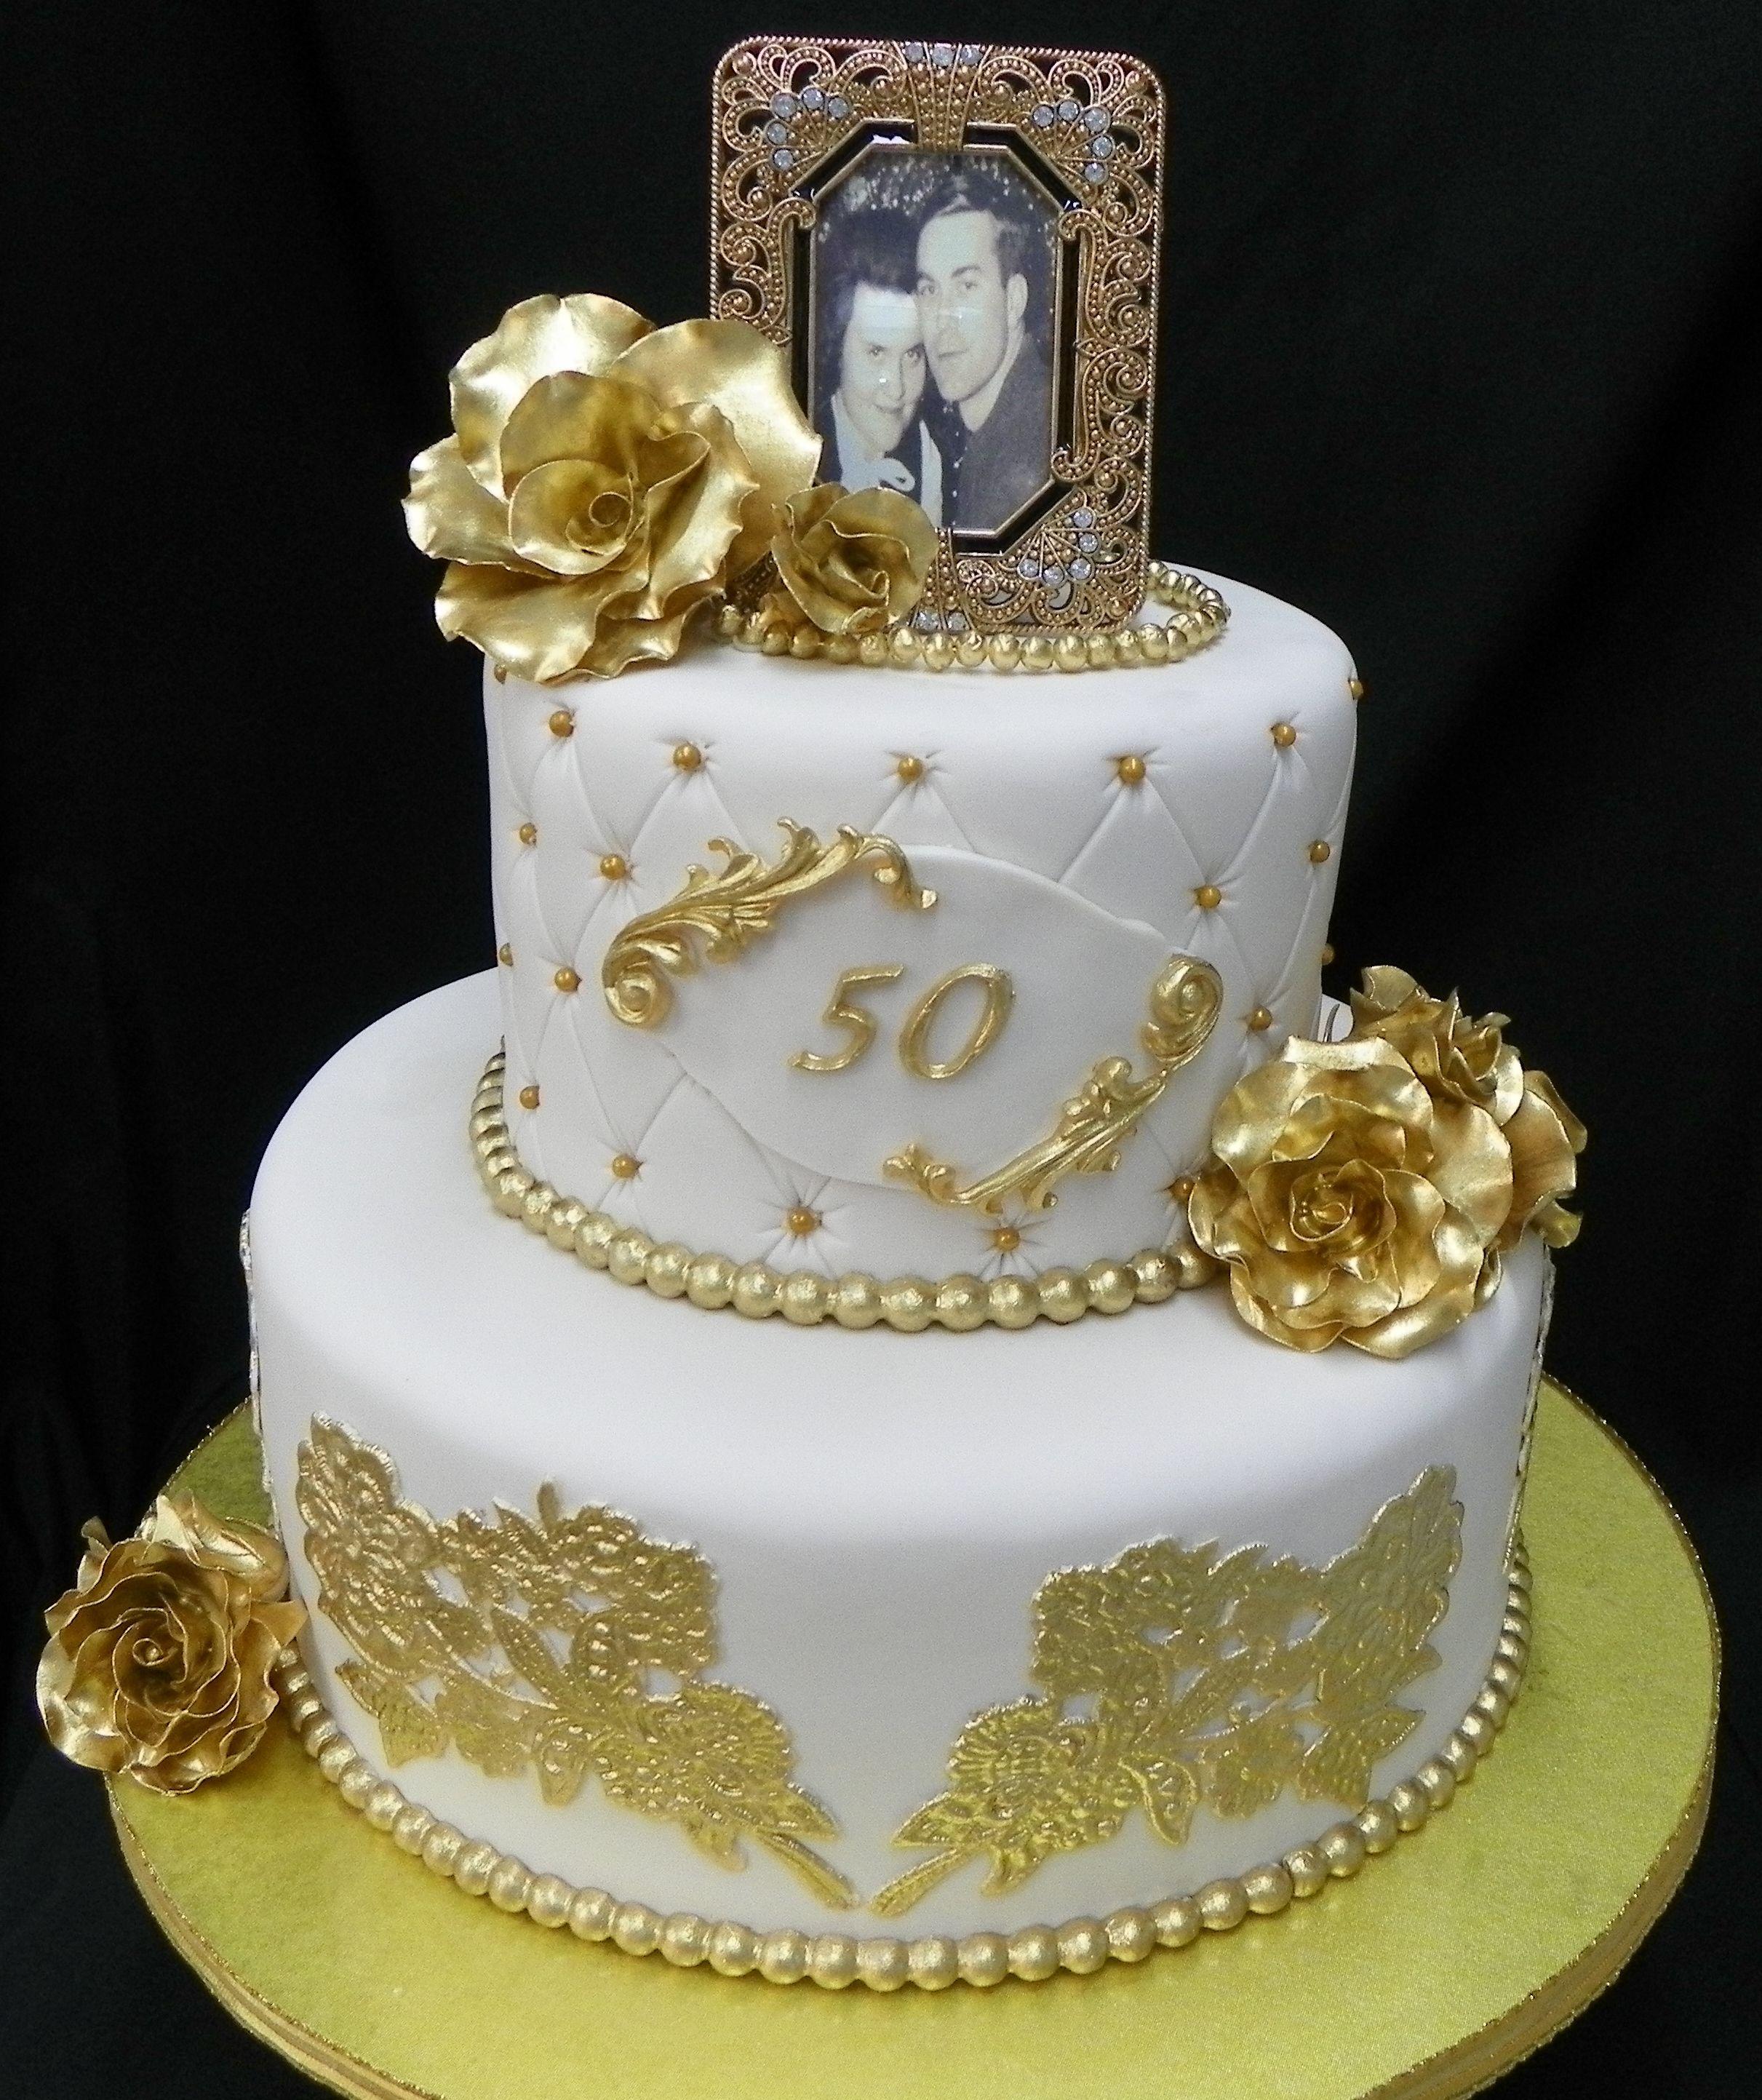 50th anniversary cake gold fondant cake 50th